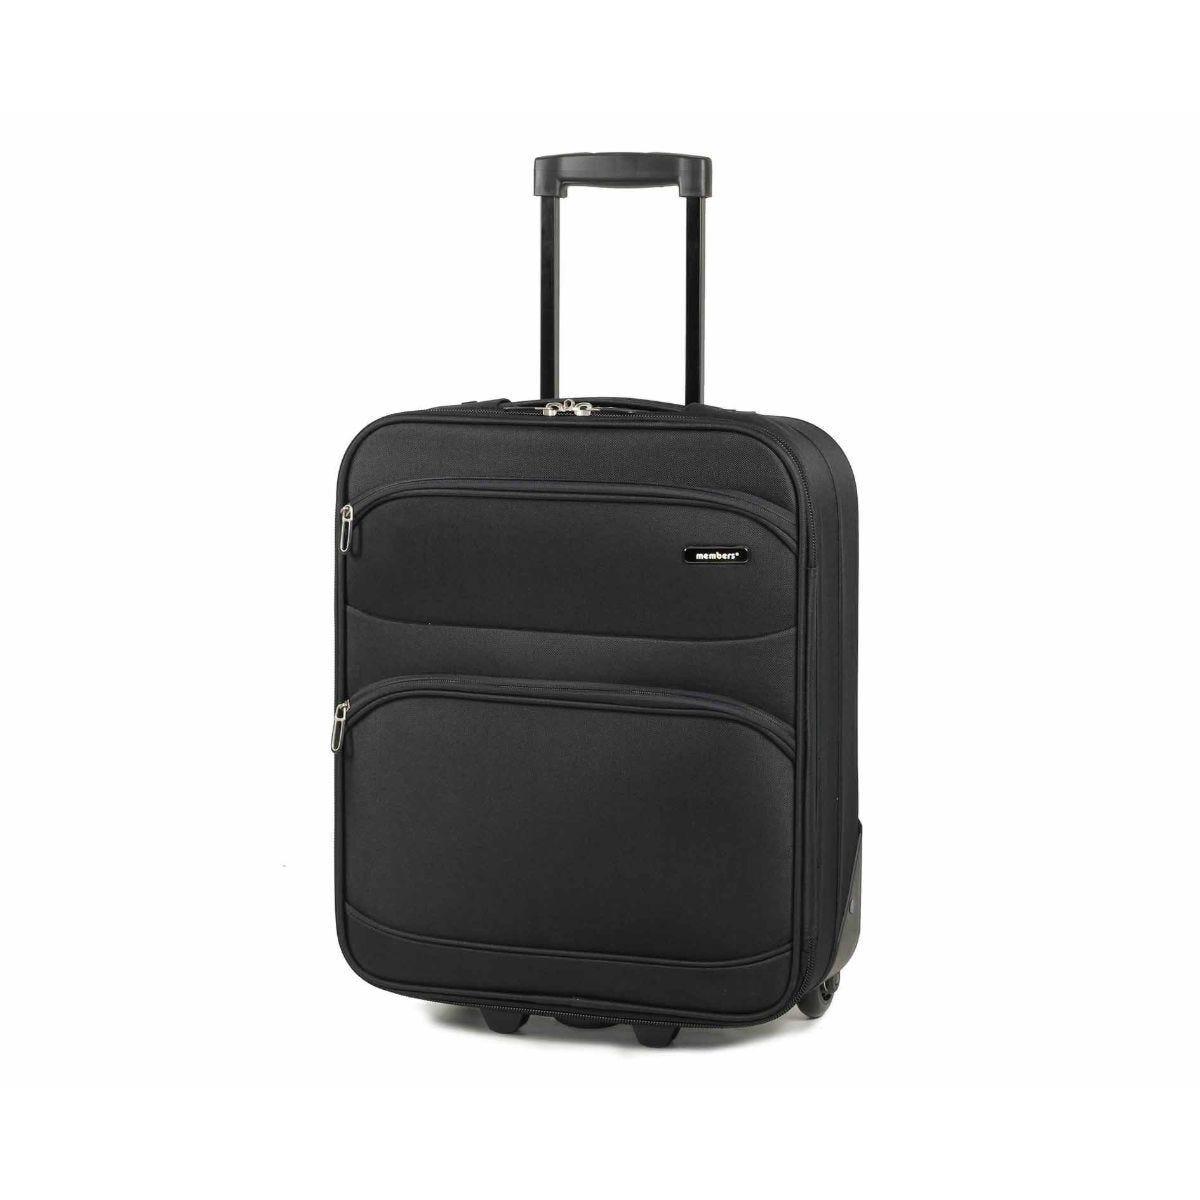 Members by Rock Topaz Carry-on Lightweight Two Wheel Trolley Suitcase 55cm Black